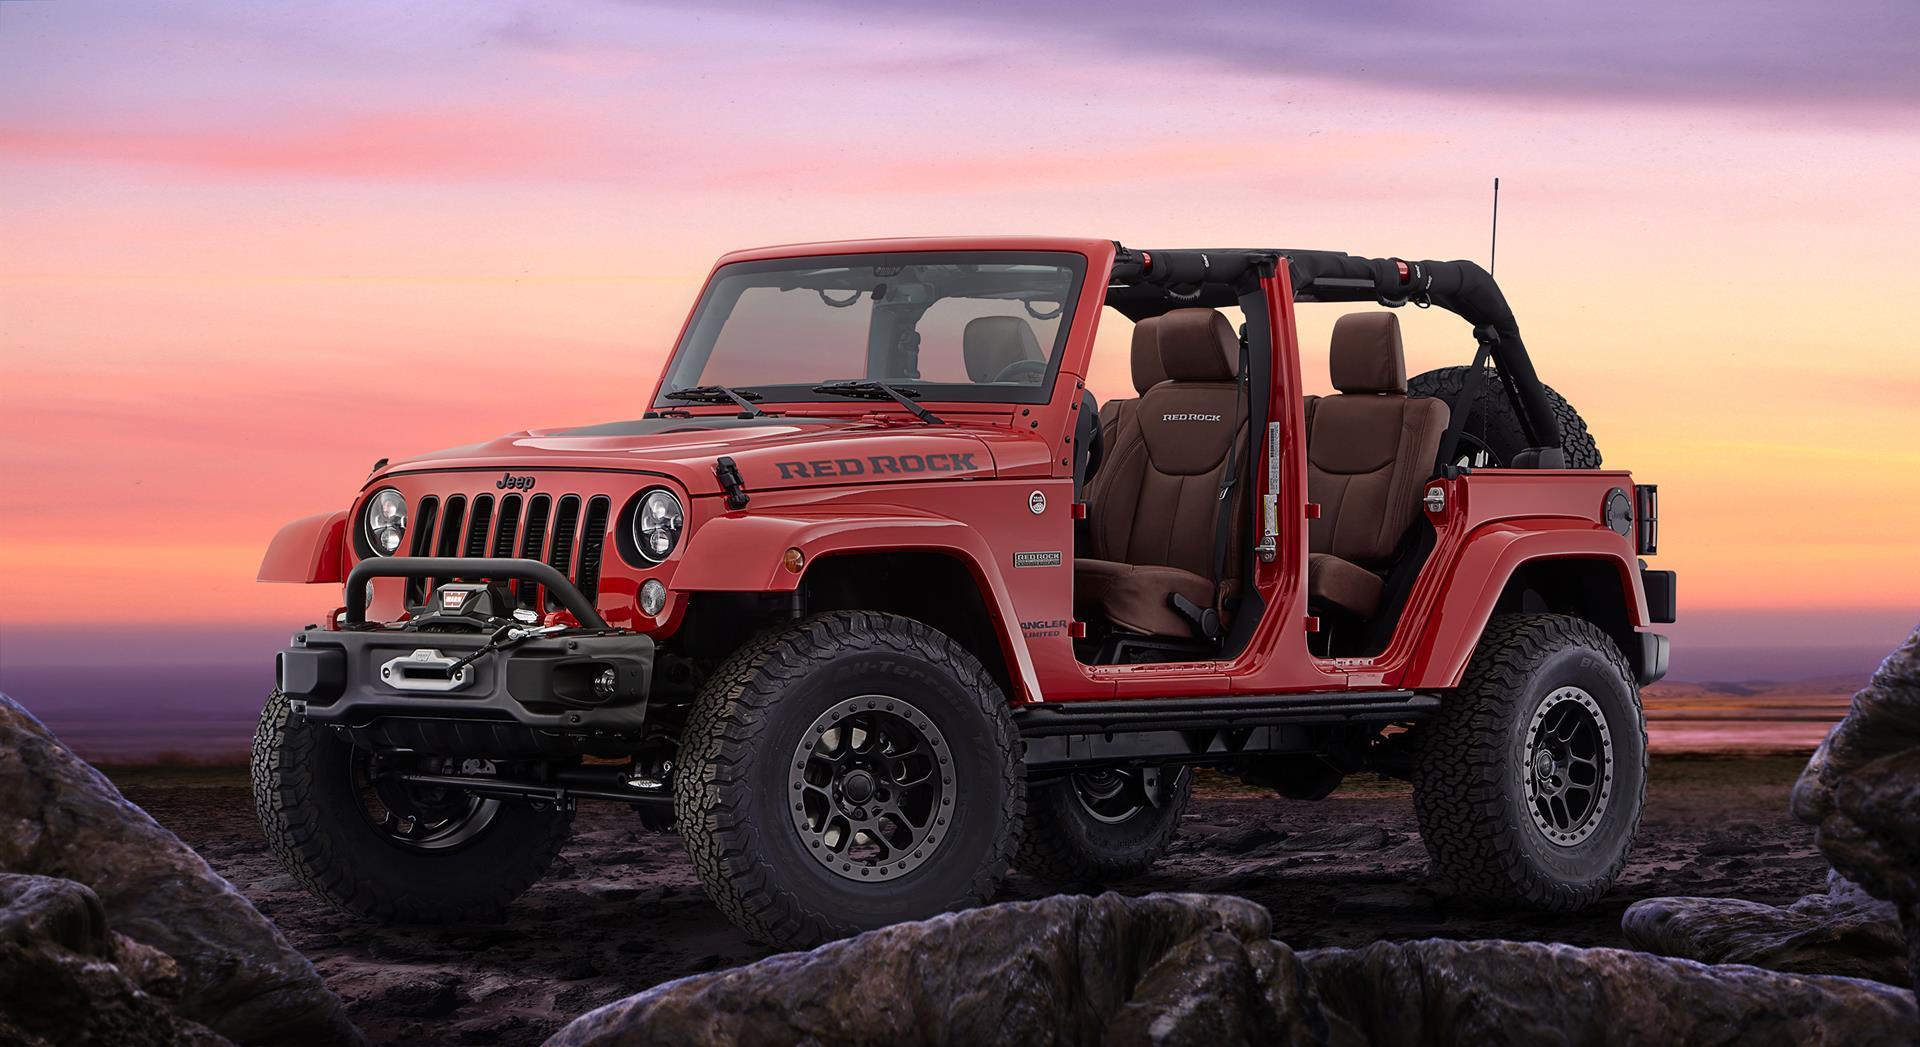 rock jeep l htm co rubicon colorado c wrangler sale hard for used in springs